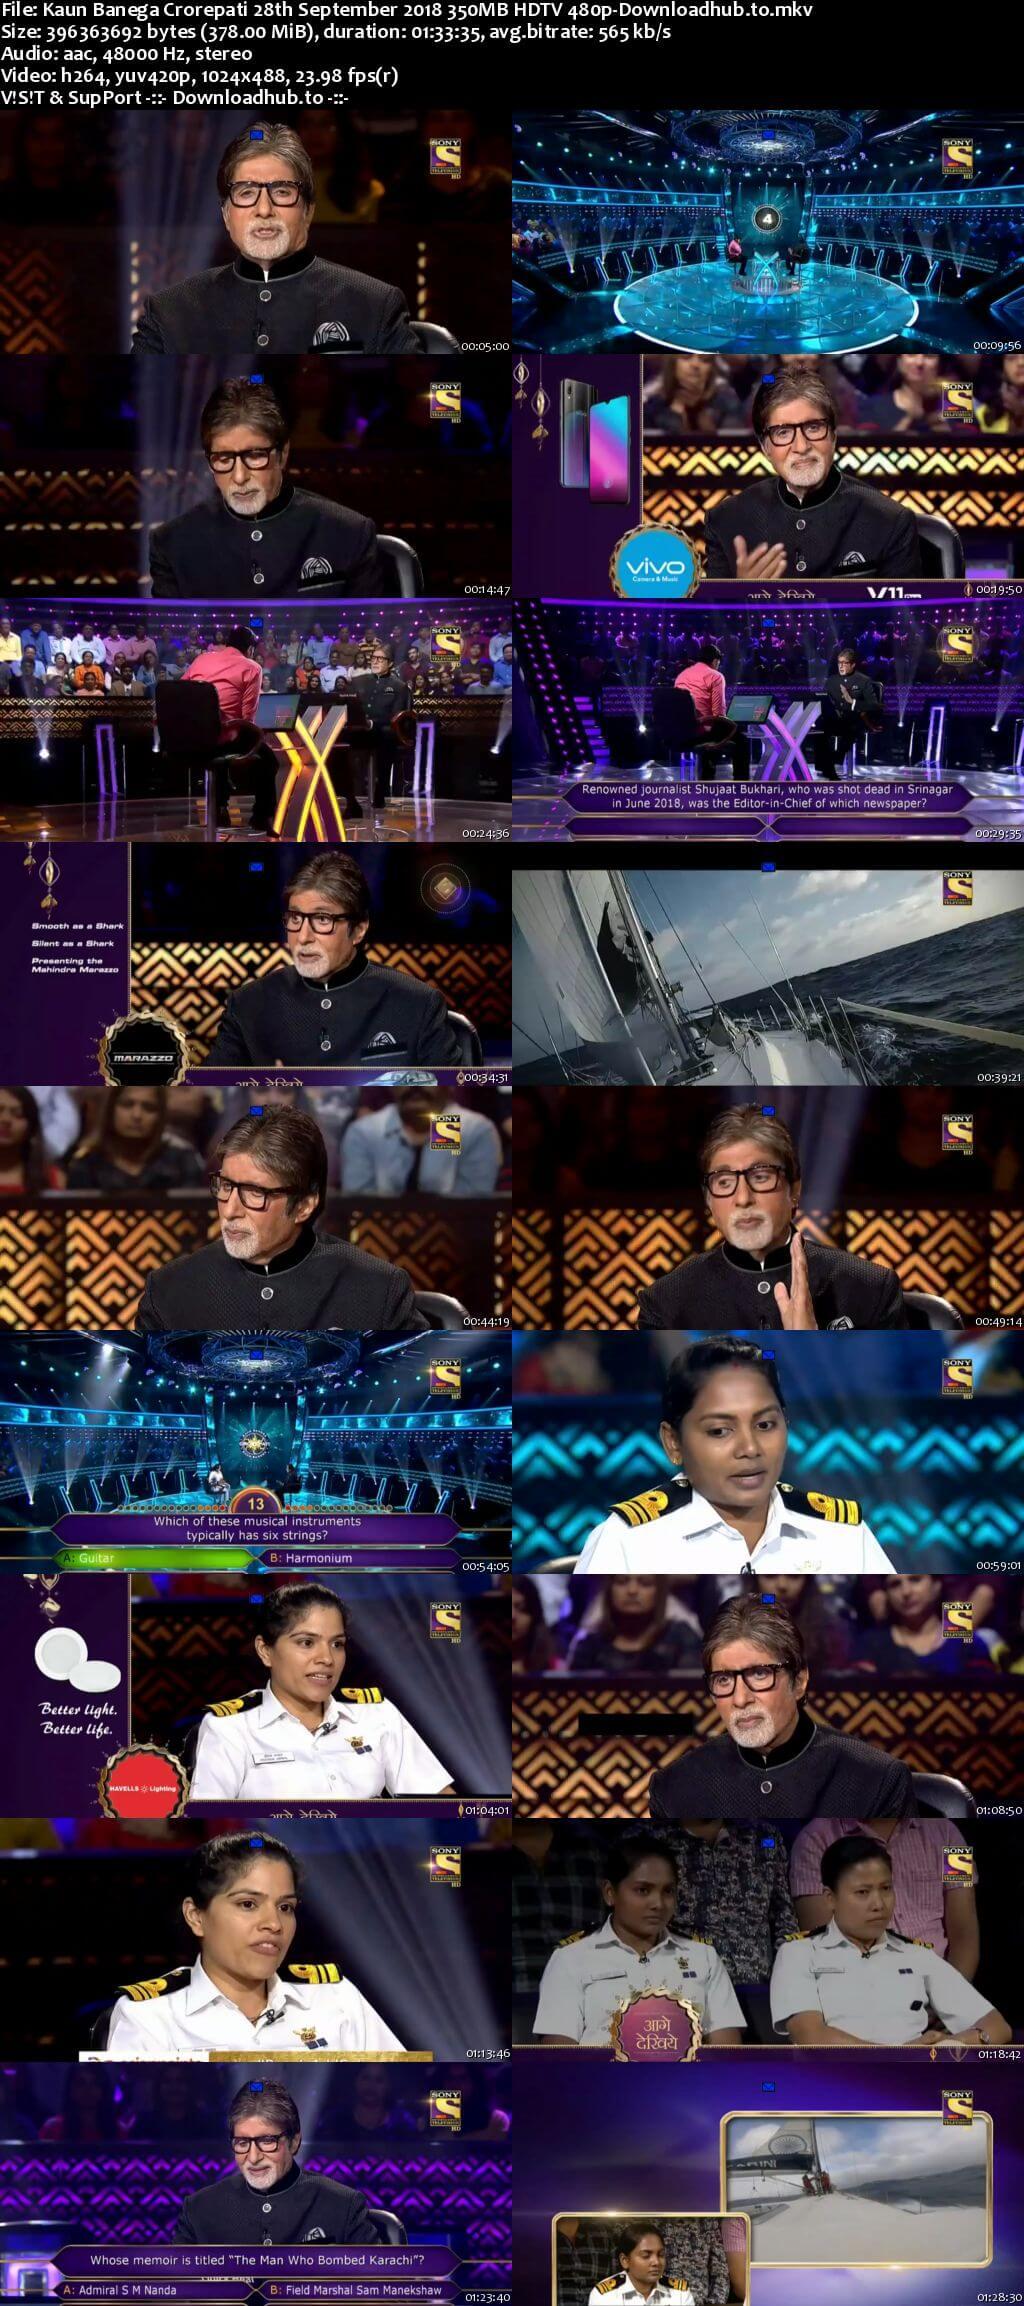 Kaun Banega Crorepati 28th September 2018 350MB HDTV 480p